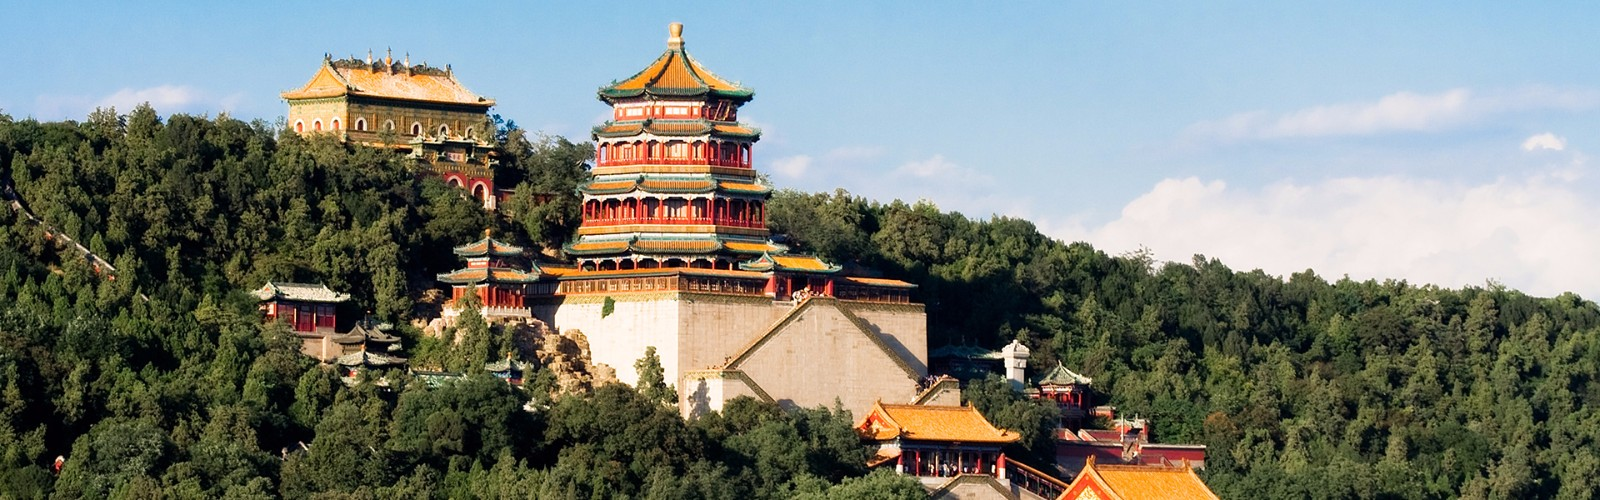 Картинки по запросу the summer palace beijing